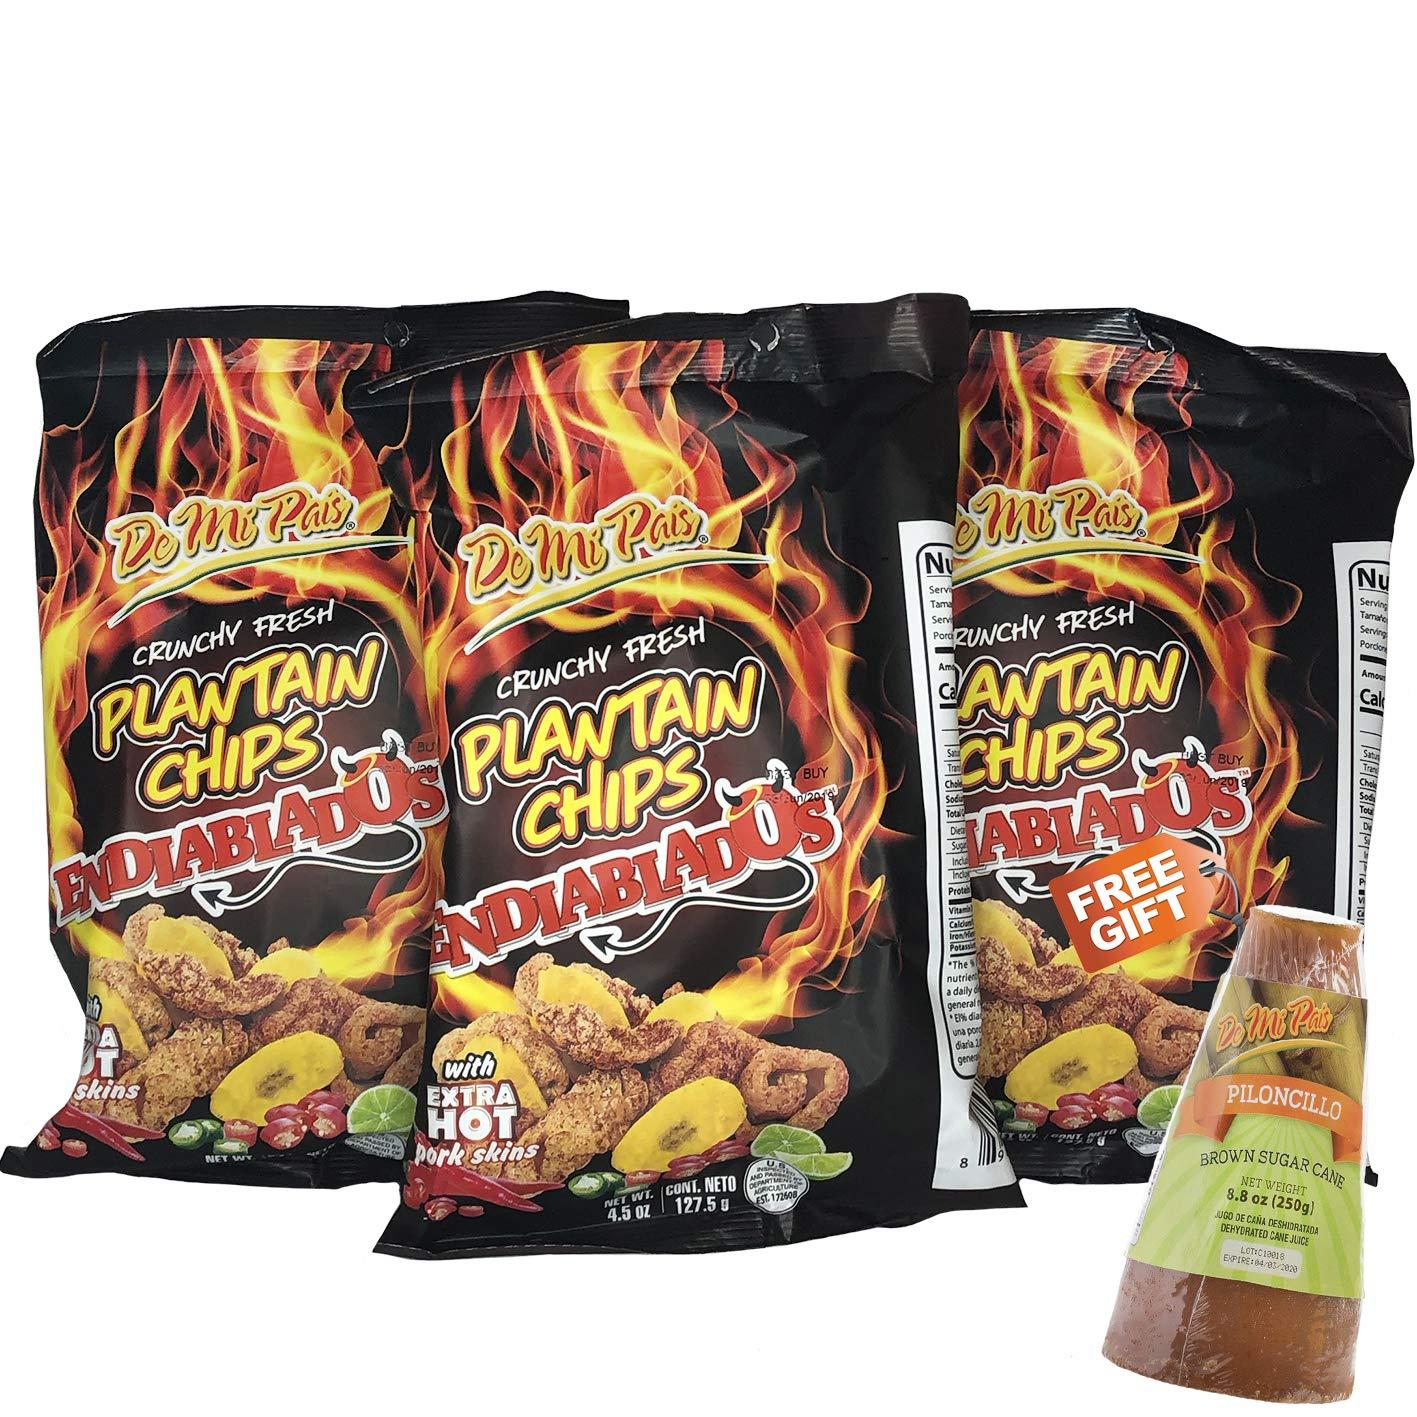 DMP Plantain Chips Devil/Endiablados 24-PACK - 1 FREE GIFT